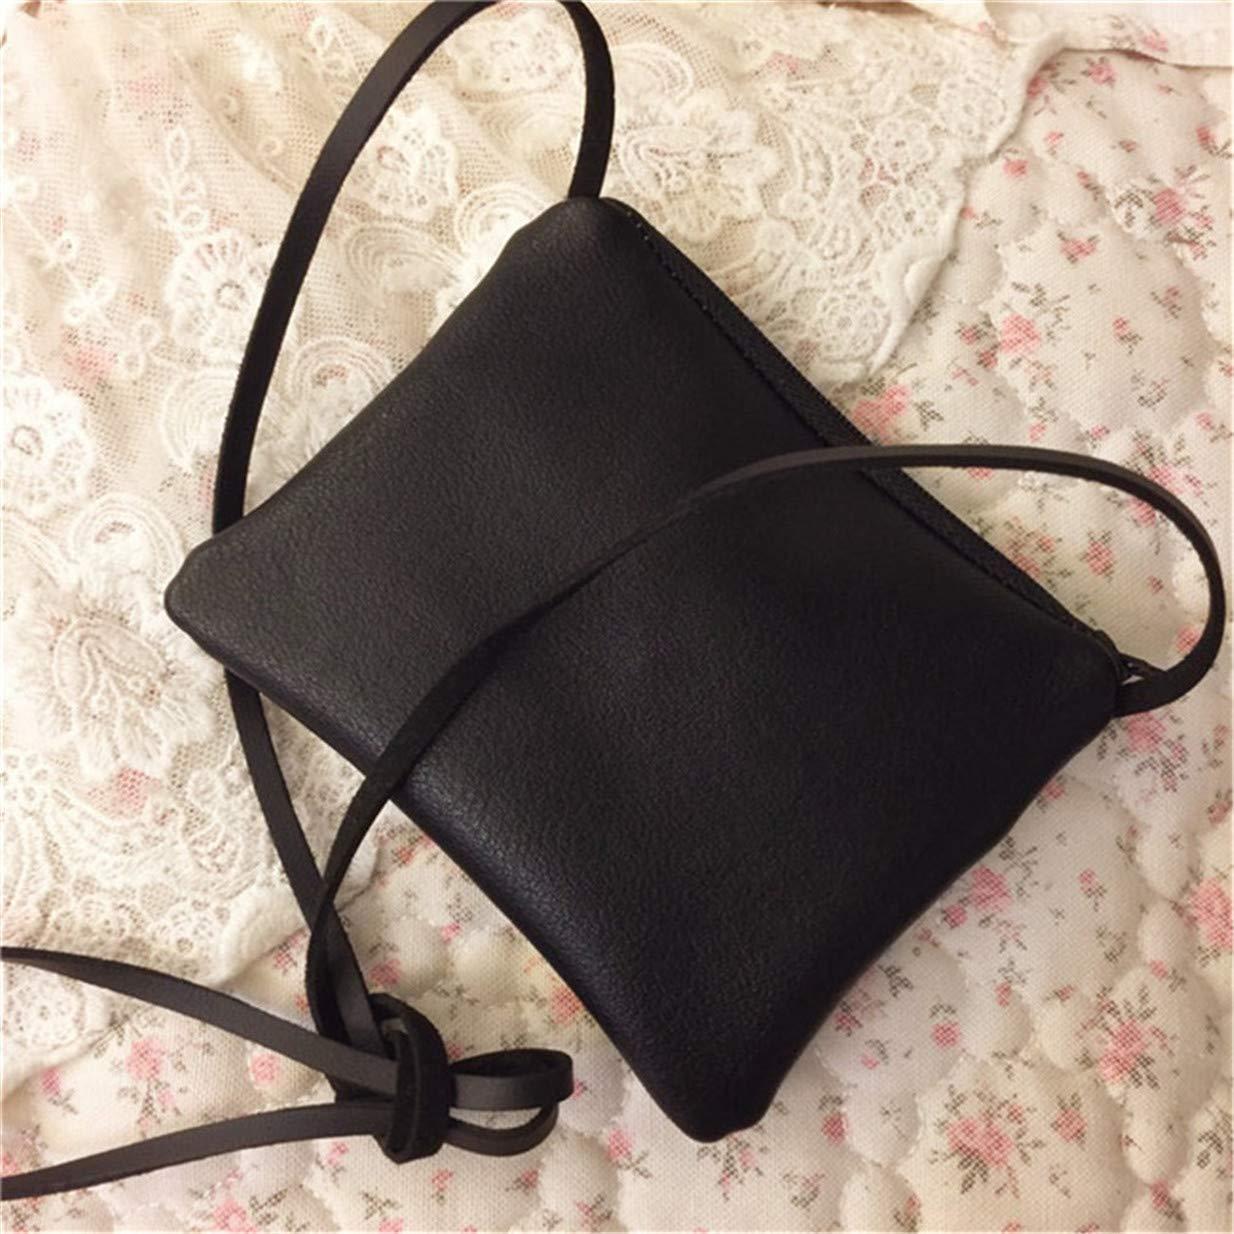 Tcplyn// Premium Girl Camera Style Crossbody Bag Wallet Coin Purse Pouch Handbag